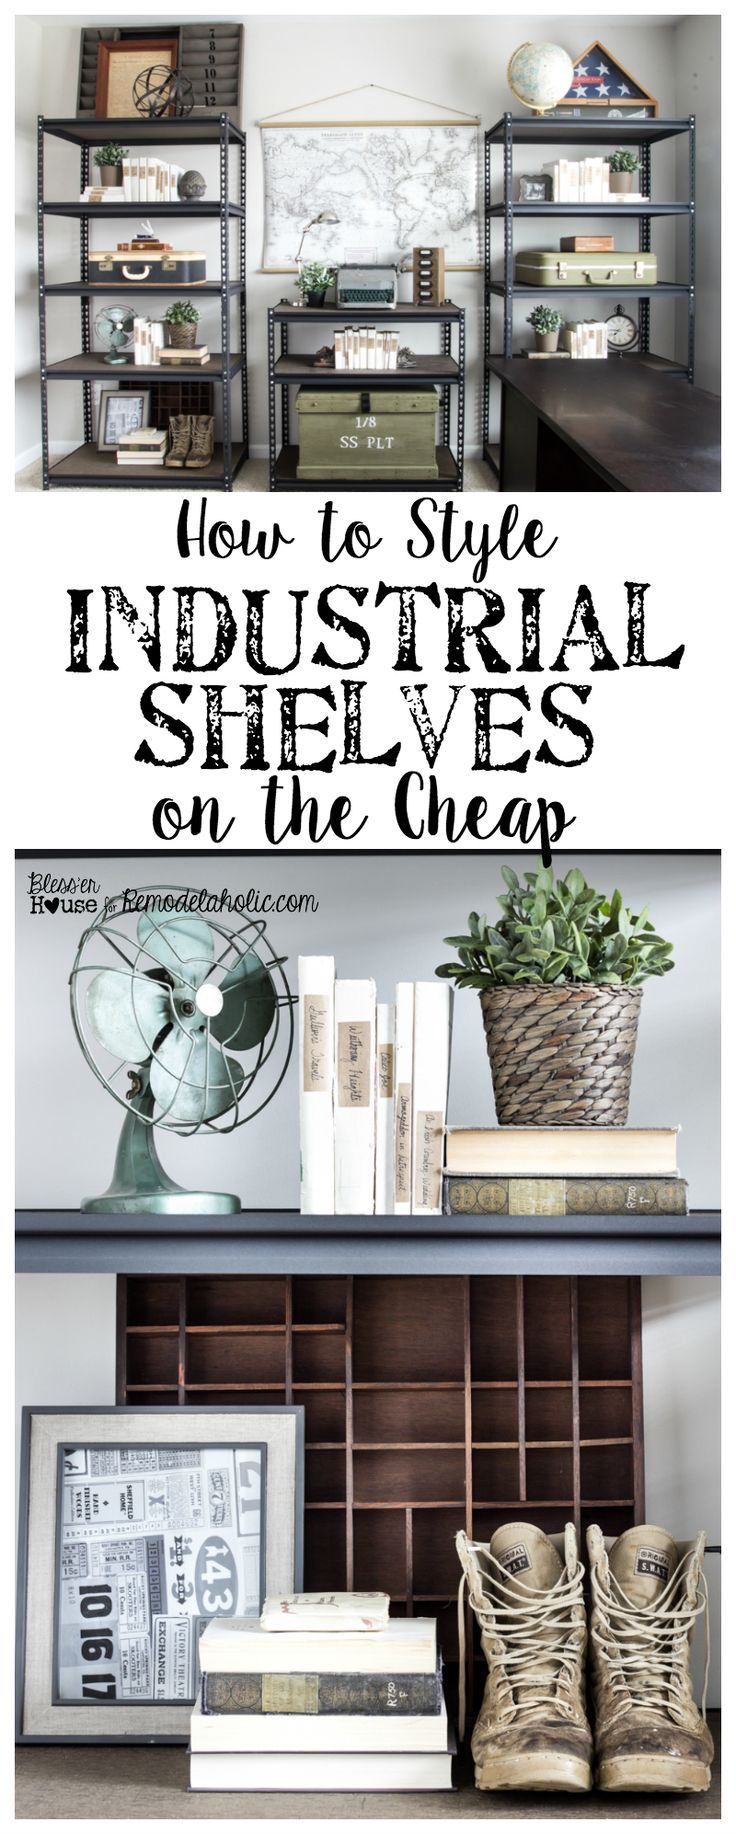 Best 25 Metal Shelving Ideas On Pinterest Metal Shelves Industry Look And Metal And Wood Paint